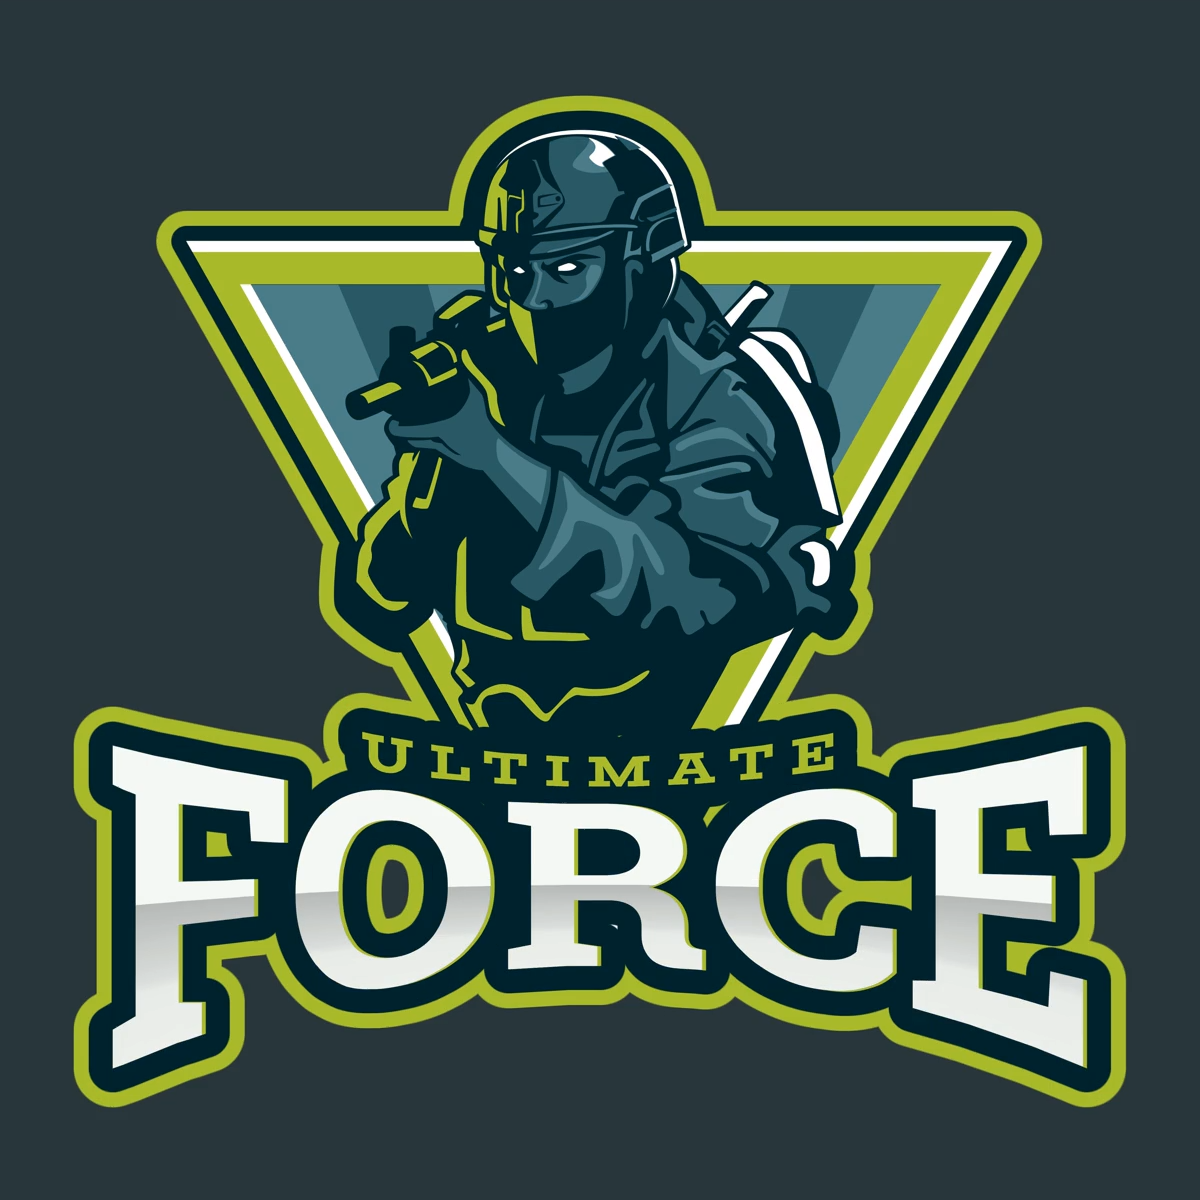 placeit logomaker JeuxVideoGraphisme in 2020 Logo